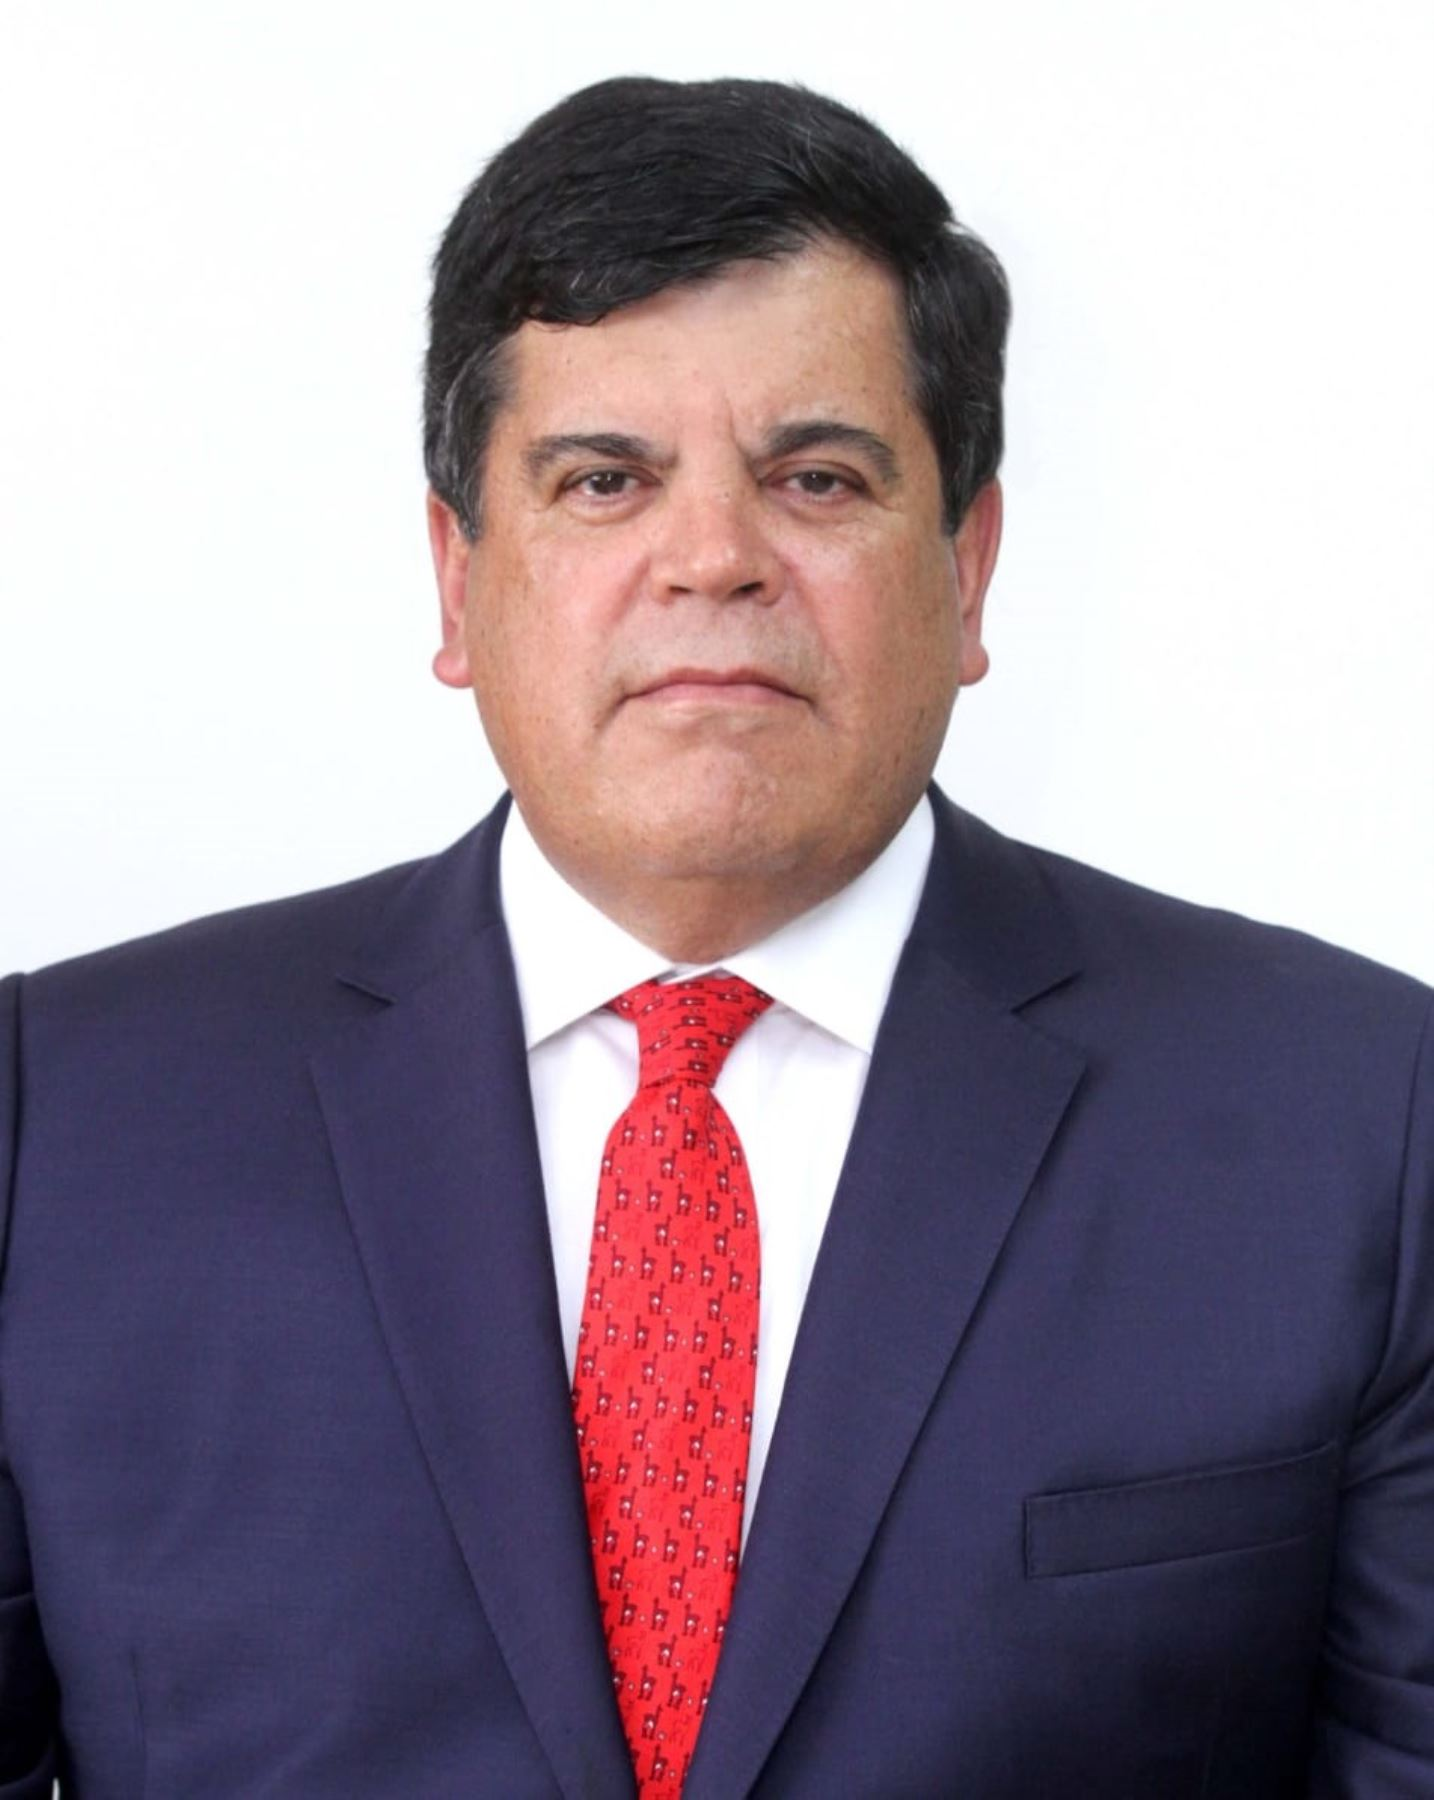 Nuevo presidente de Petroperú, Carlos Eduardo Paredes Lanatta.